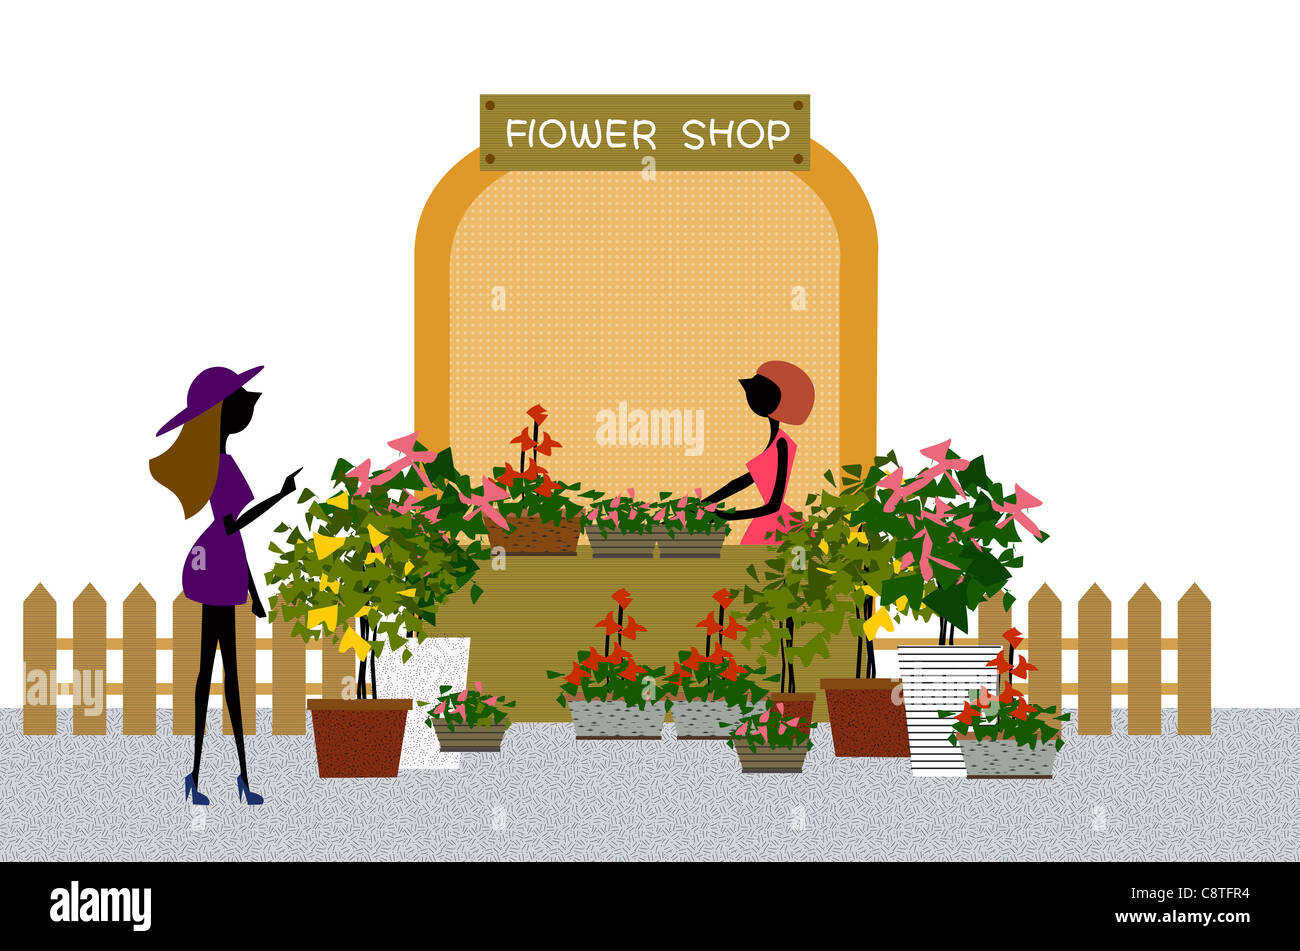 Mujeres en Floristería Mostrar Imagen De Stock